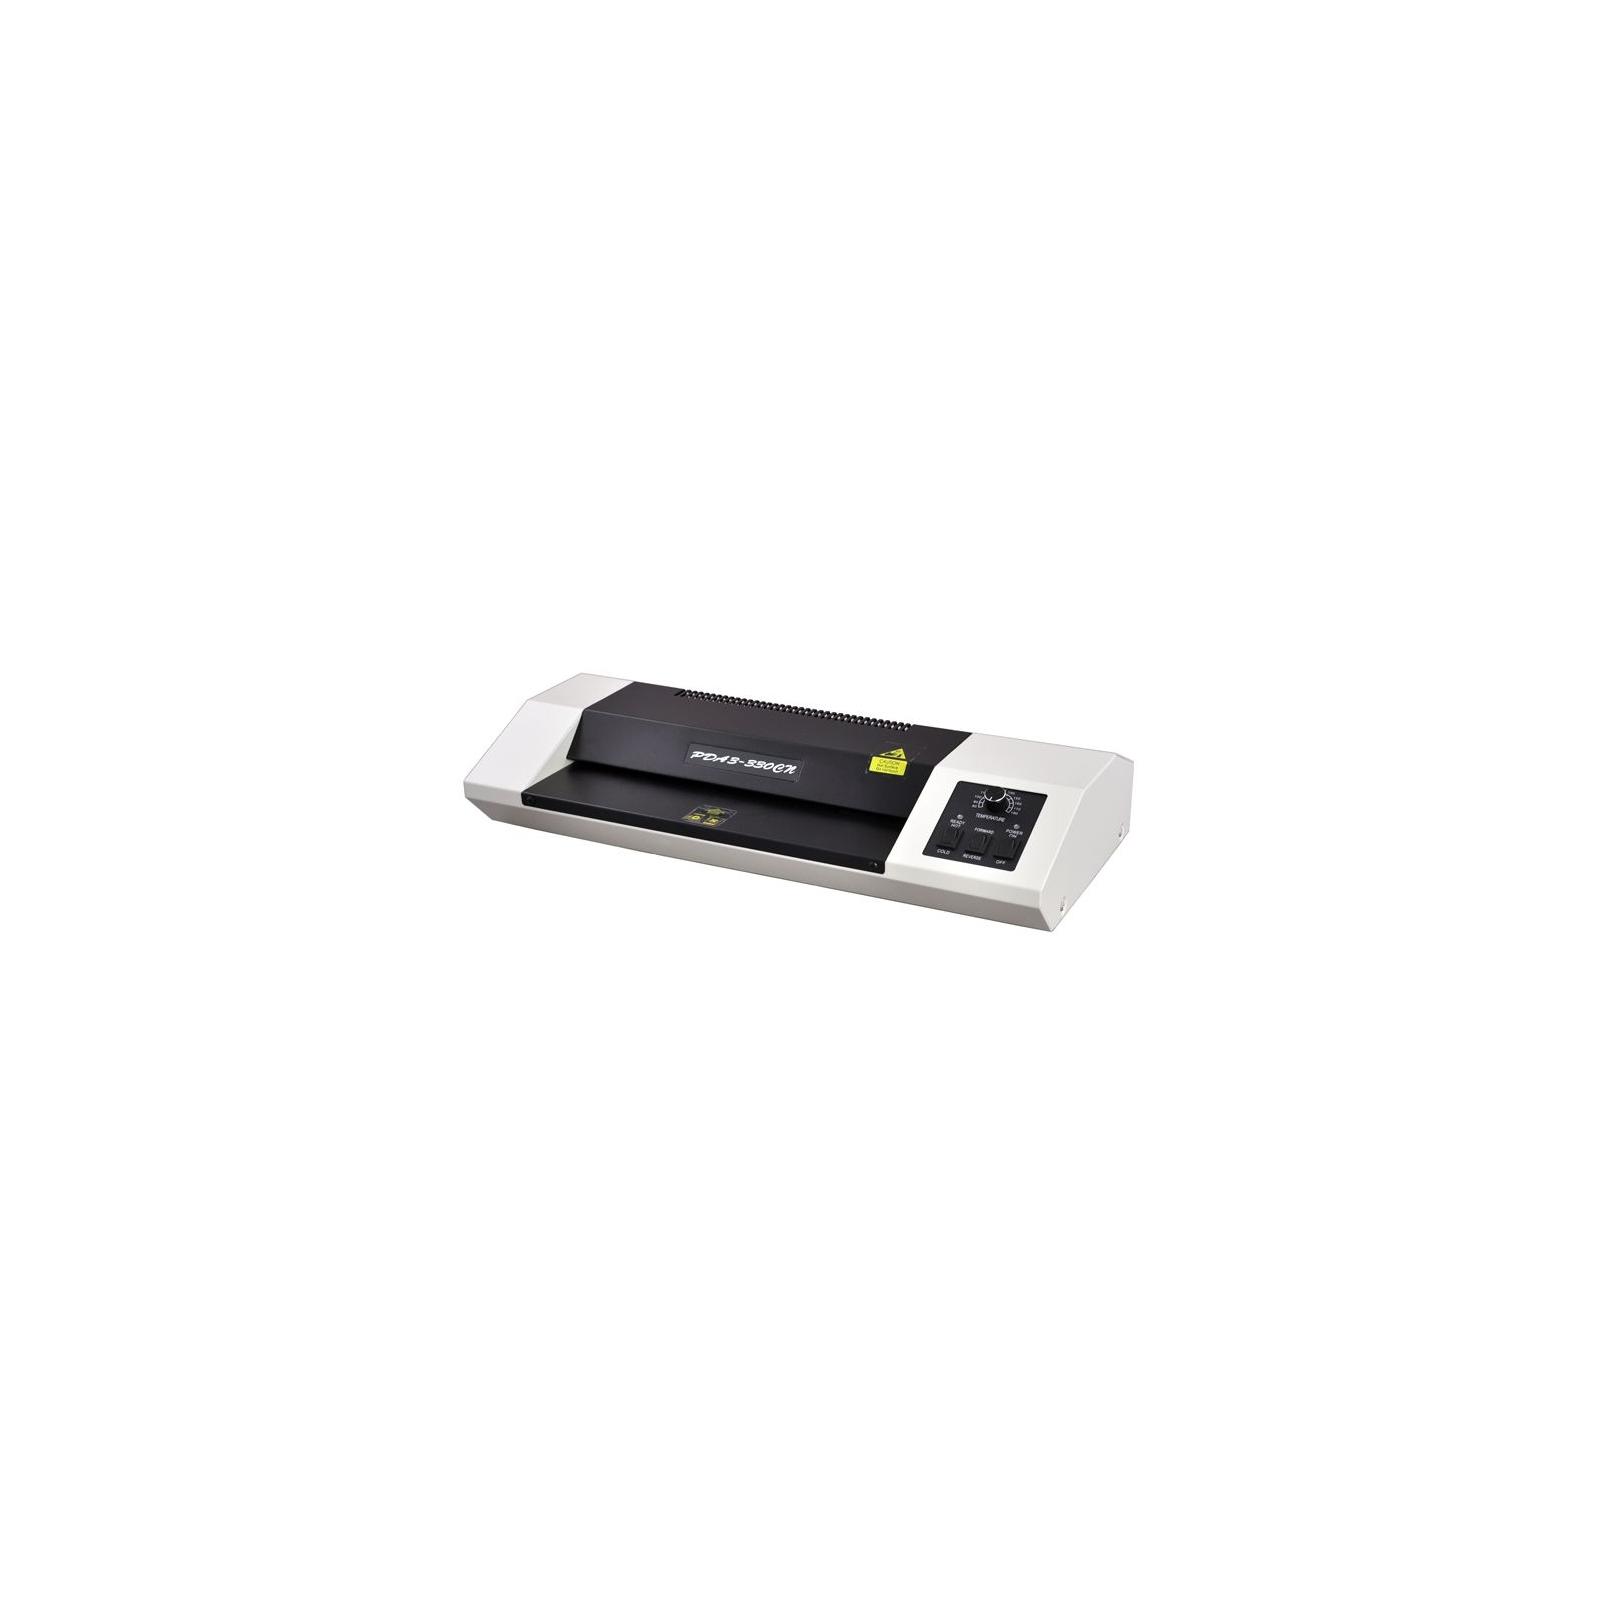 Ламинатор FGK PDA3-330CN (20358)